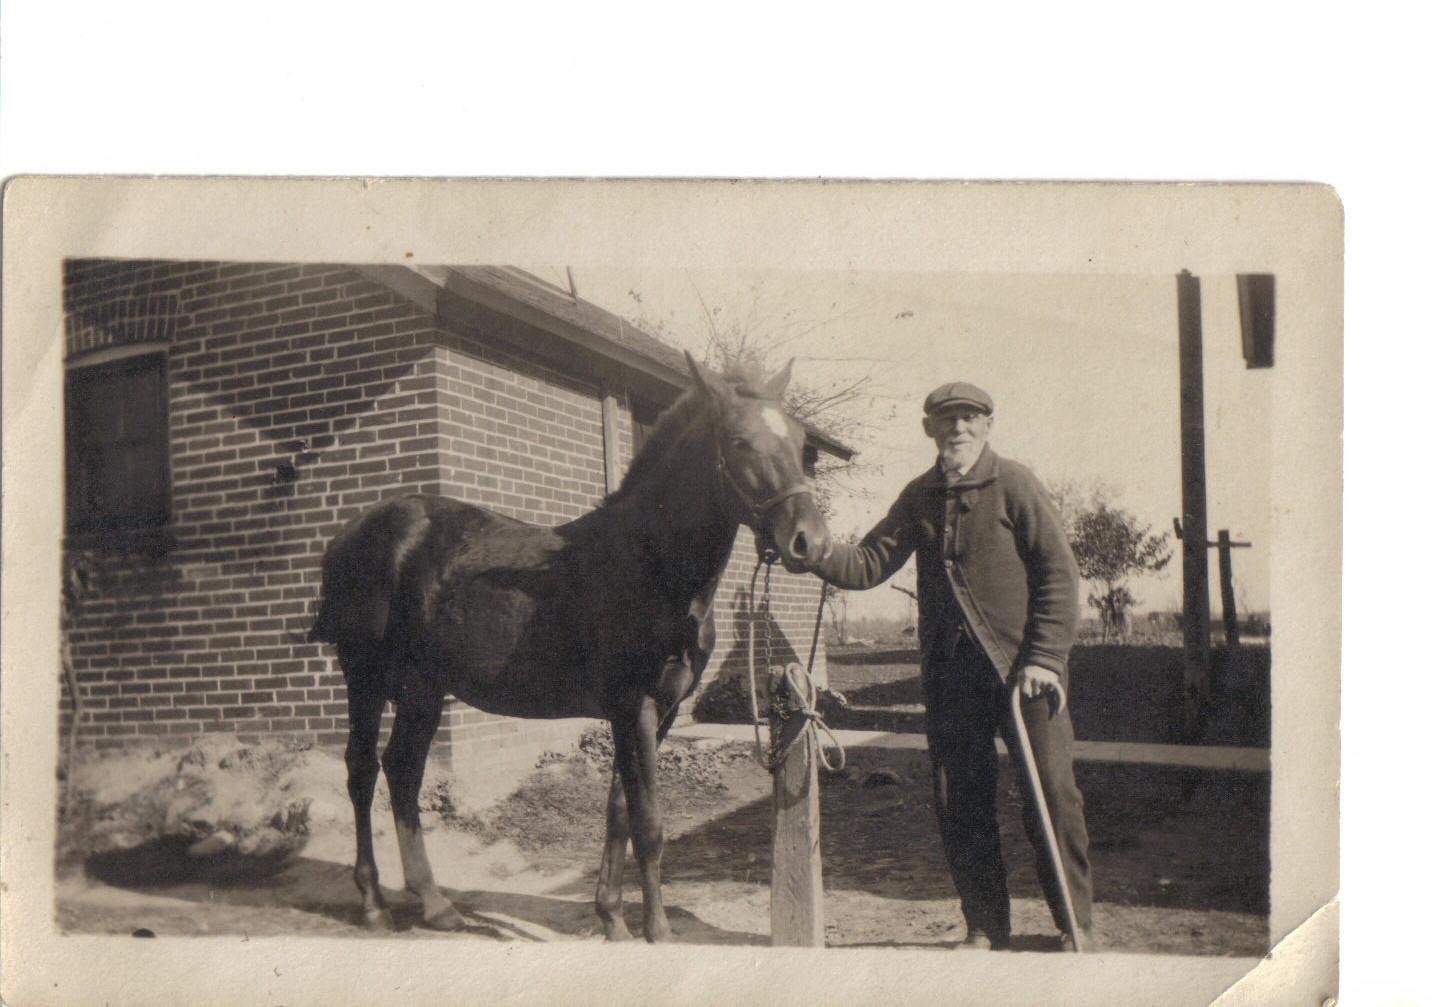 Jared Blake with Horse